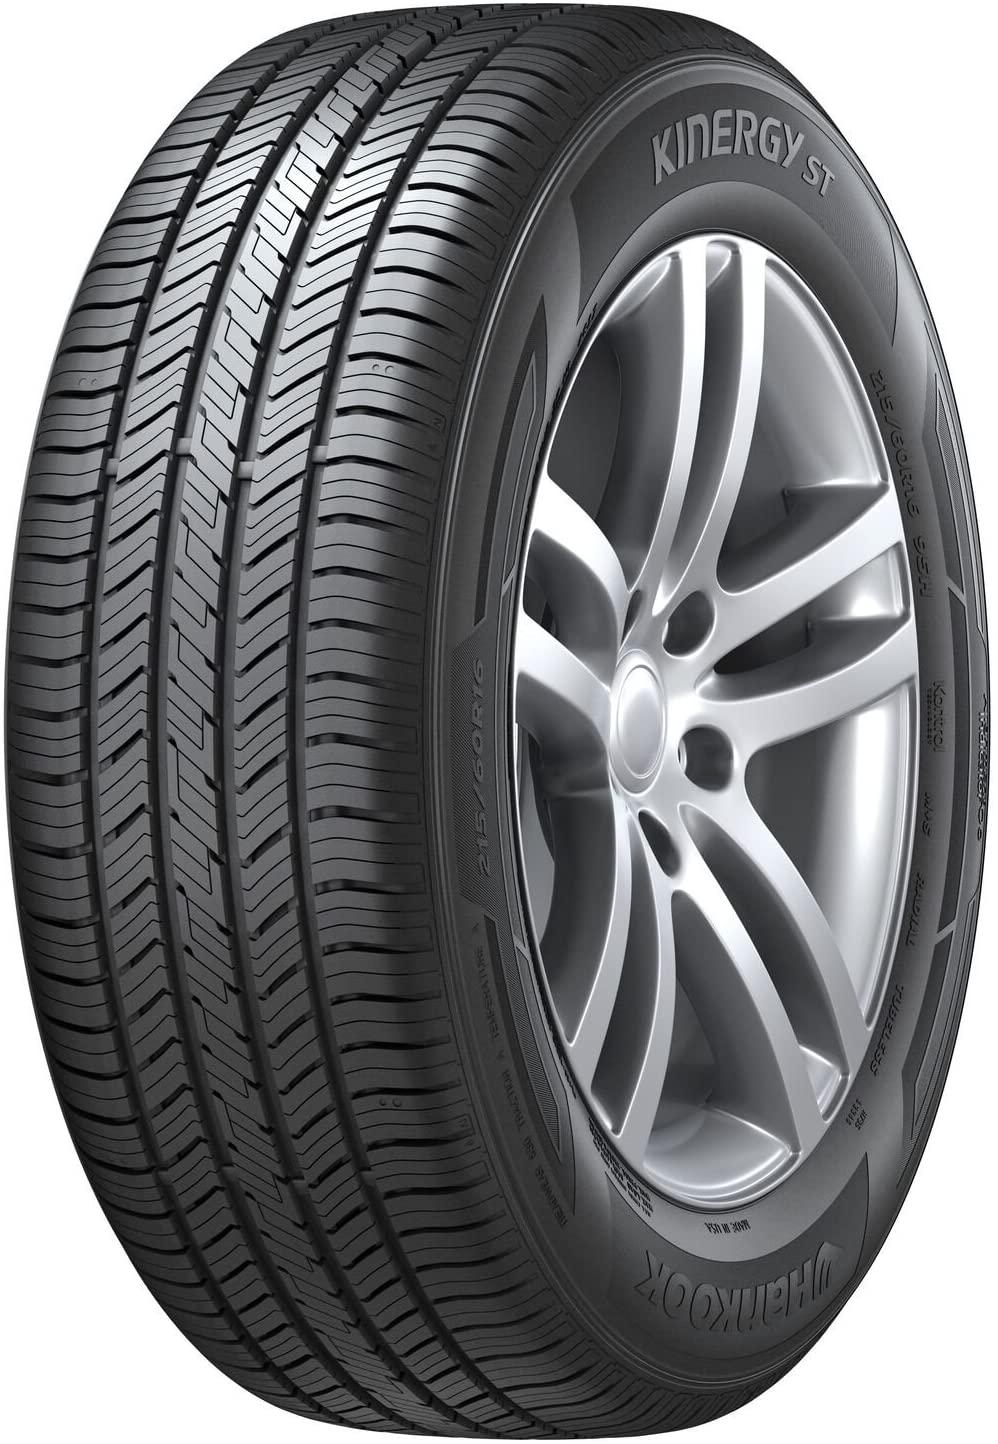 Hankook Kinergy ST H735 All-Season Radial Tire - 235/65R17 104H